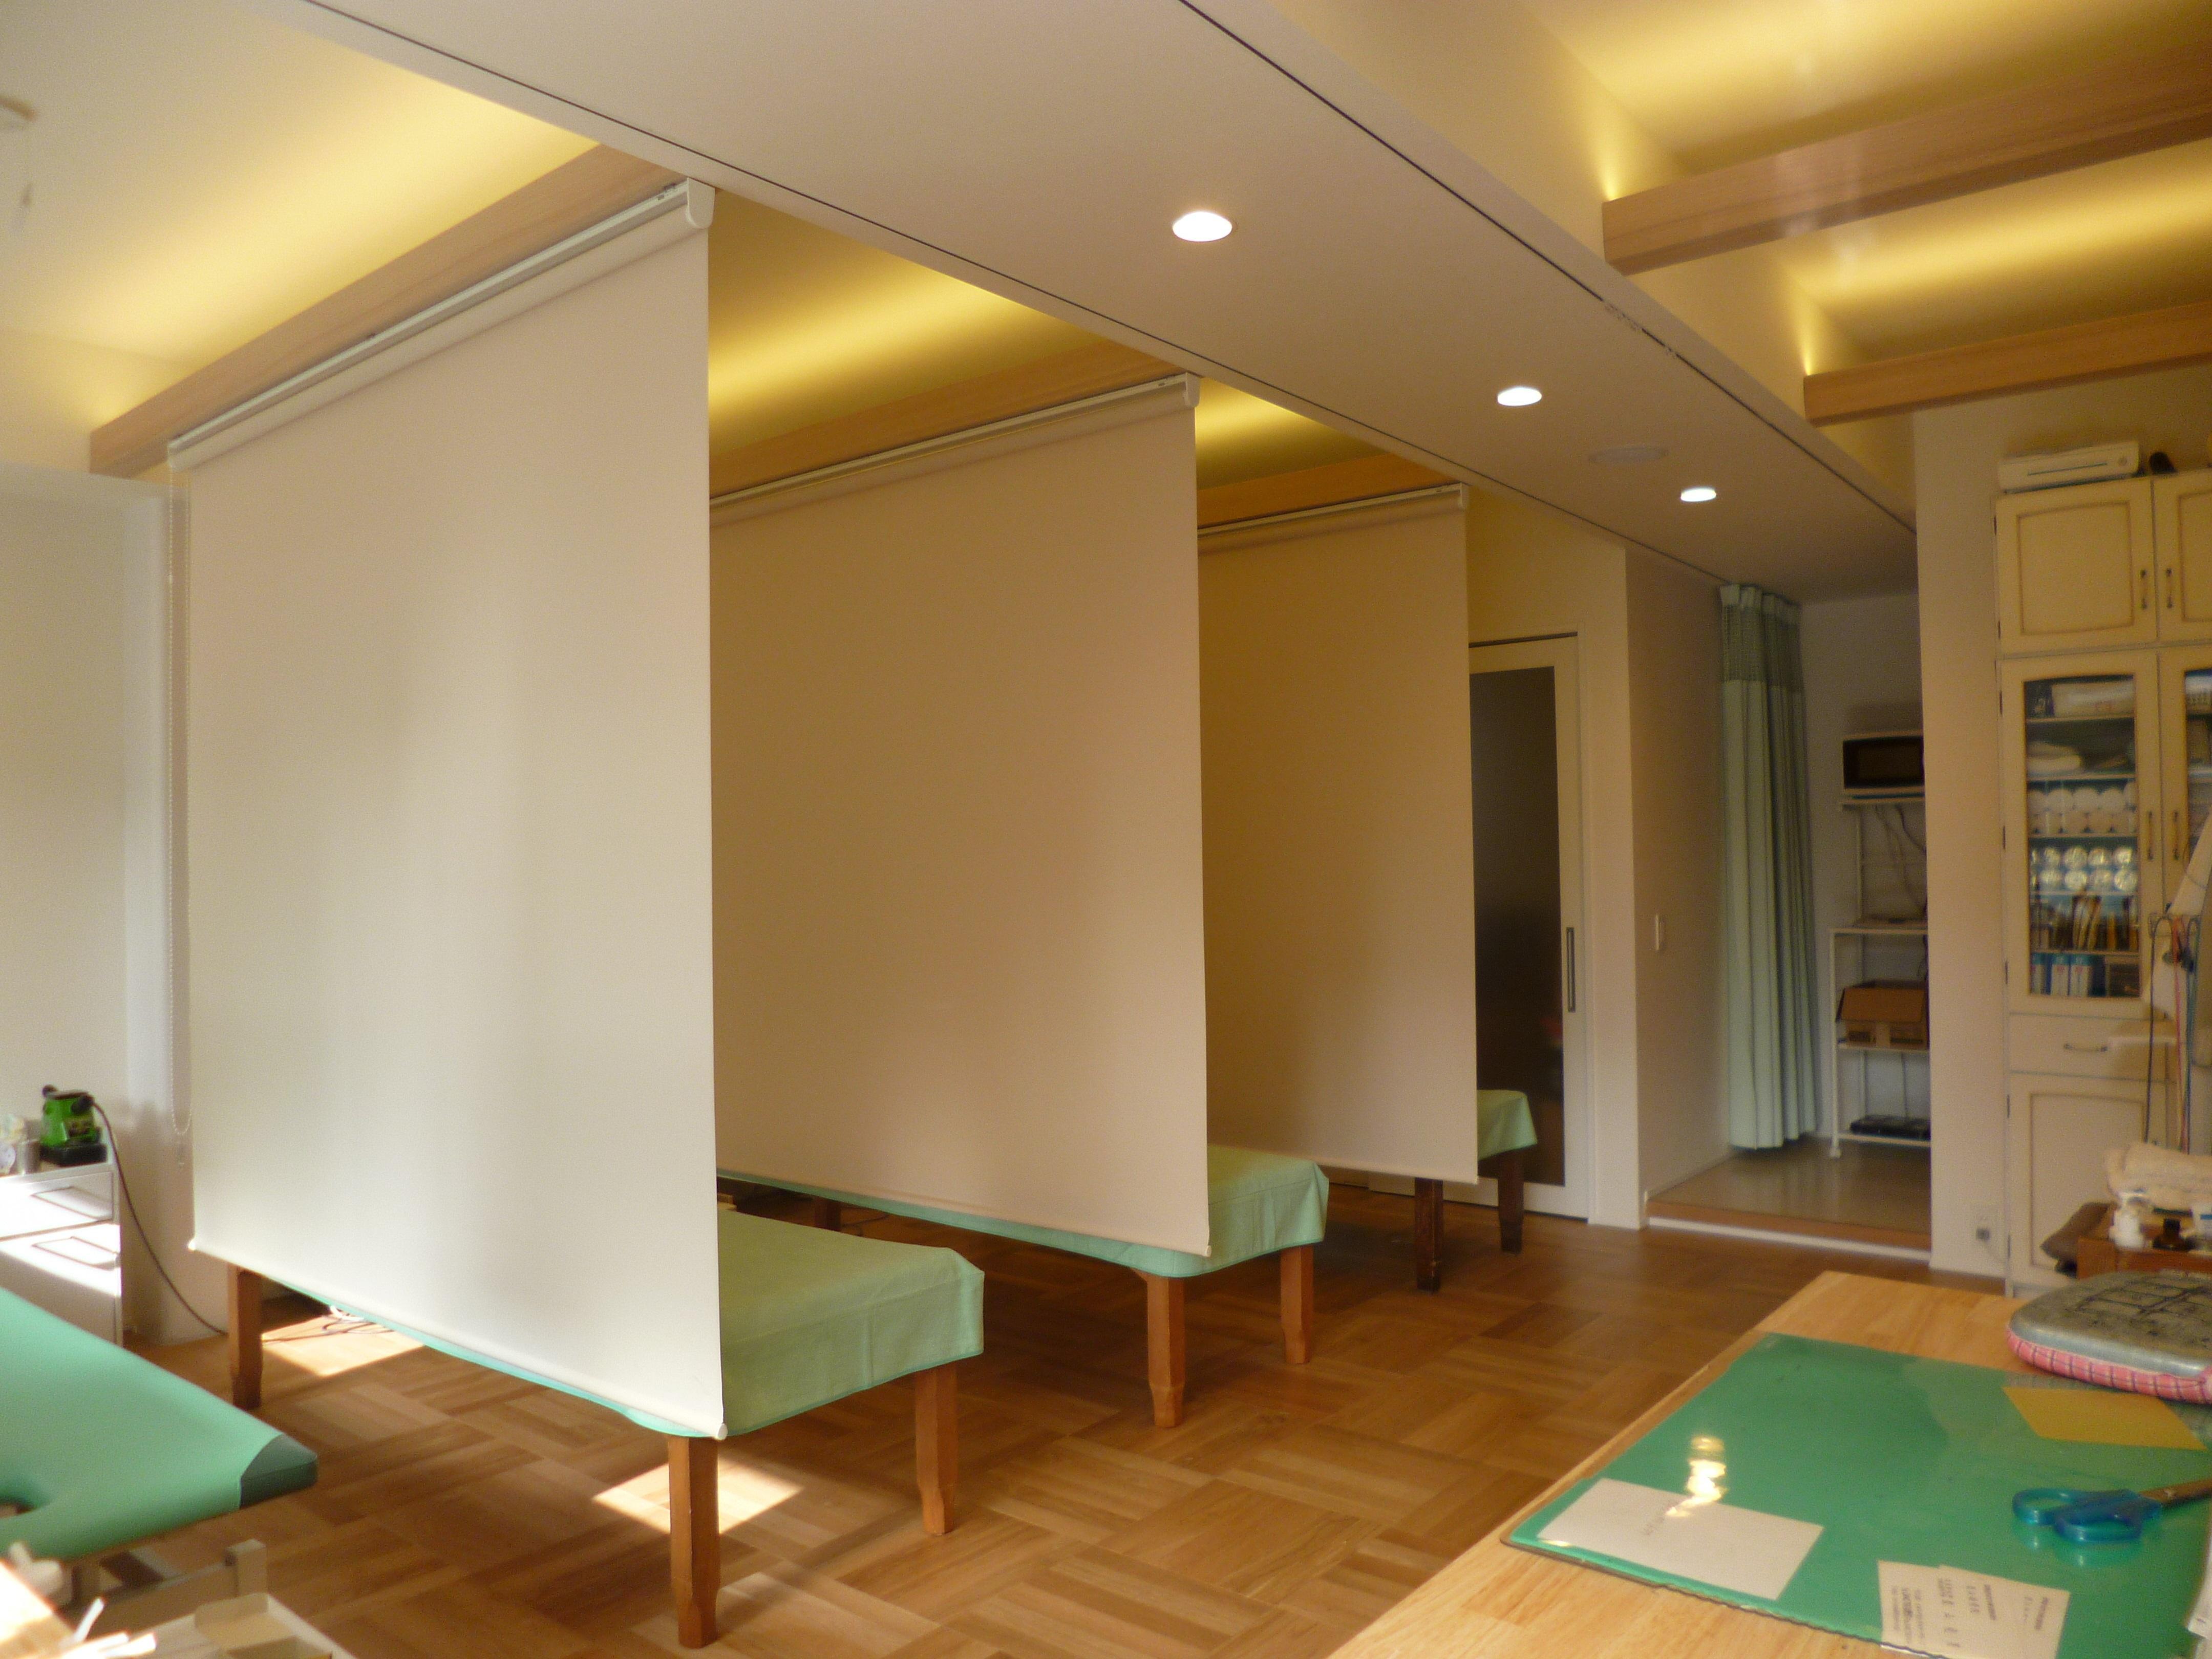 KRYM-元住吉の医院併用二世帯住宅の部屋 医院併用二世帯住宅